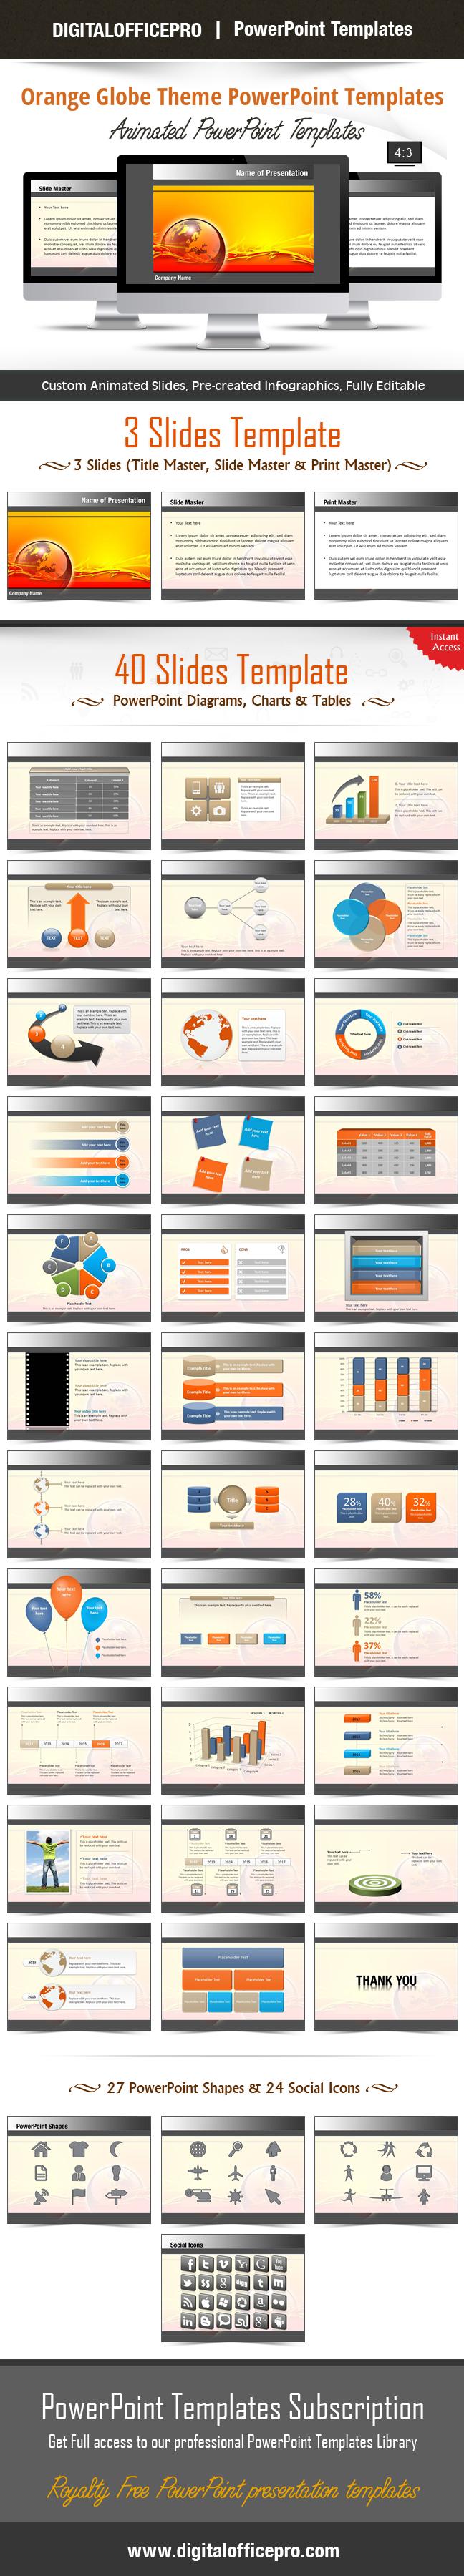 Orange globe theme powerpoint template backgrounds toneelgroepblik Images